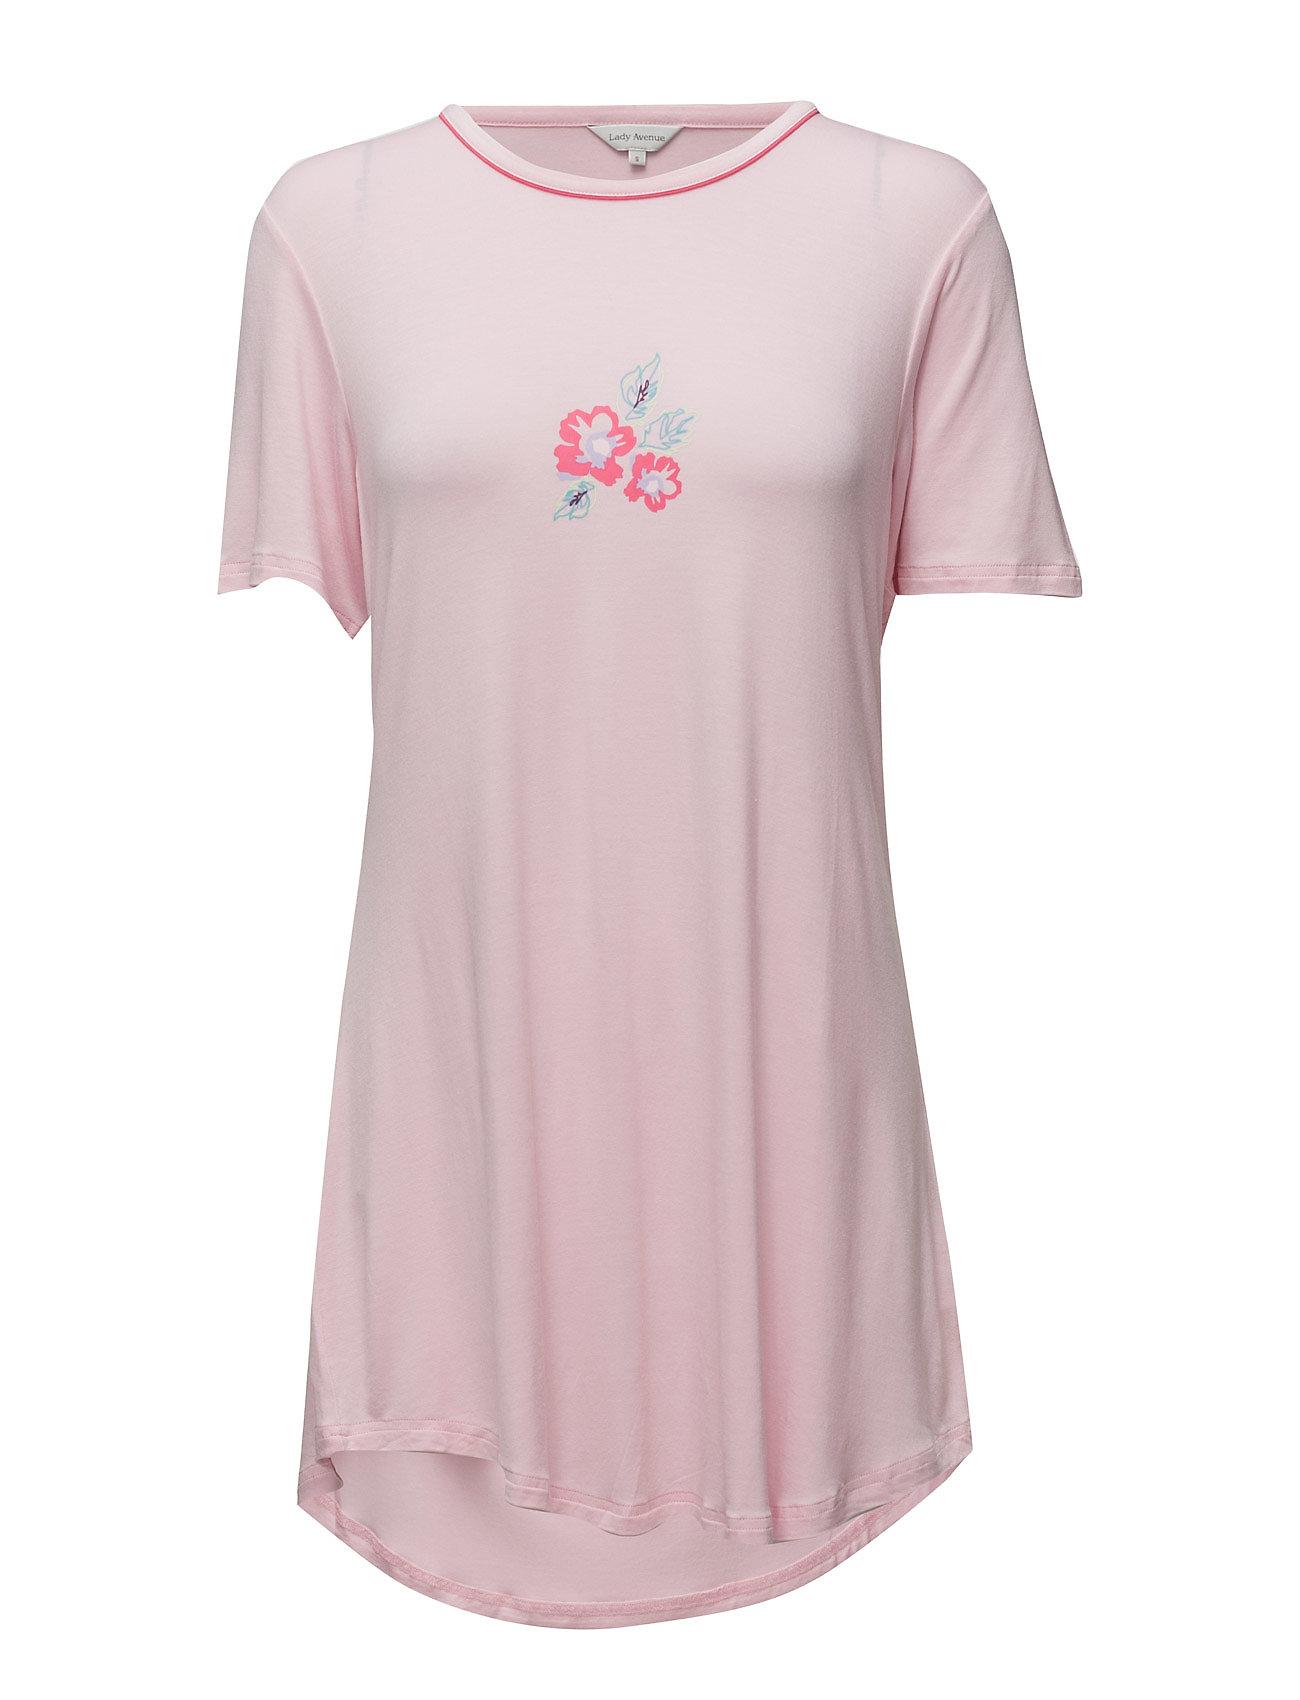 lady avenue Big shirt på boozt.com dk